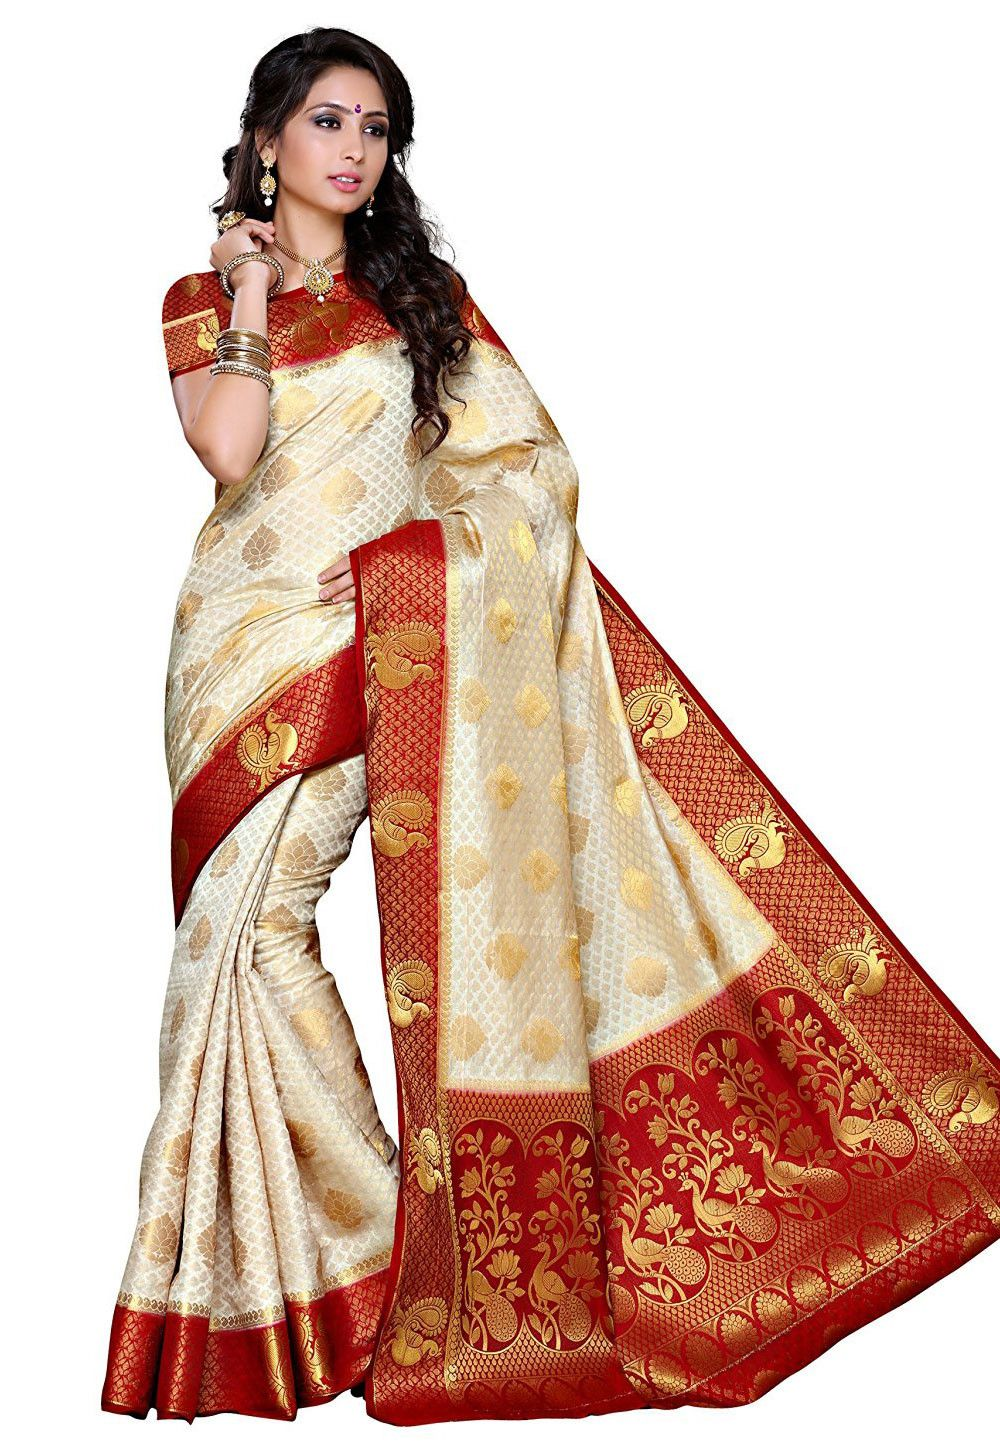 b4292f986e Buy Woven Tussar Silk Saree in White online,Item code: SEH1410, Occasion:  Wedding, Work: Traditional, Zari, Fabric: Art Silk, Gender: Women